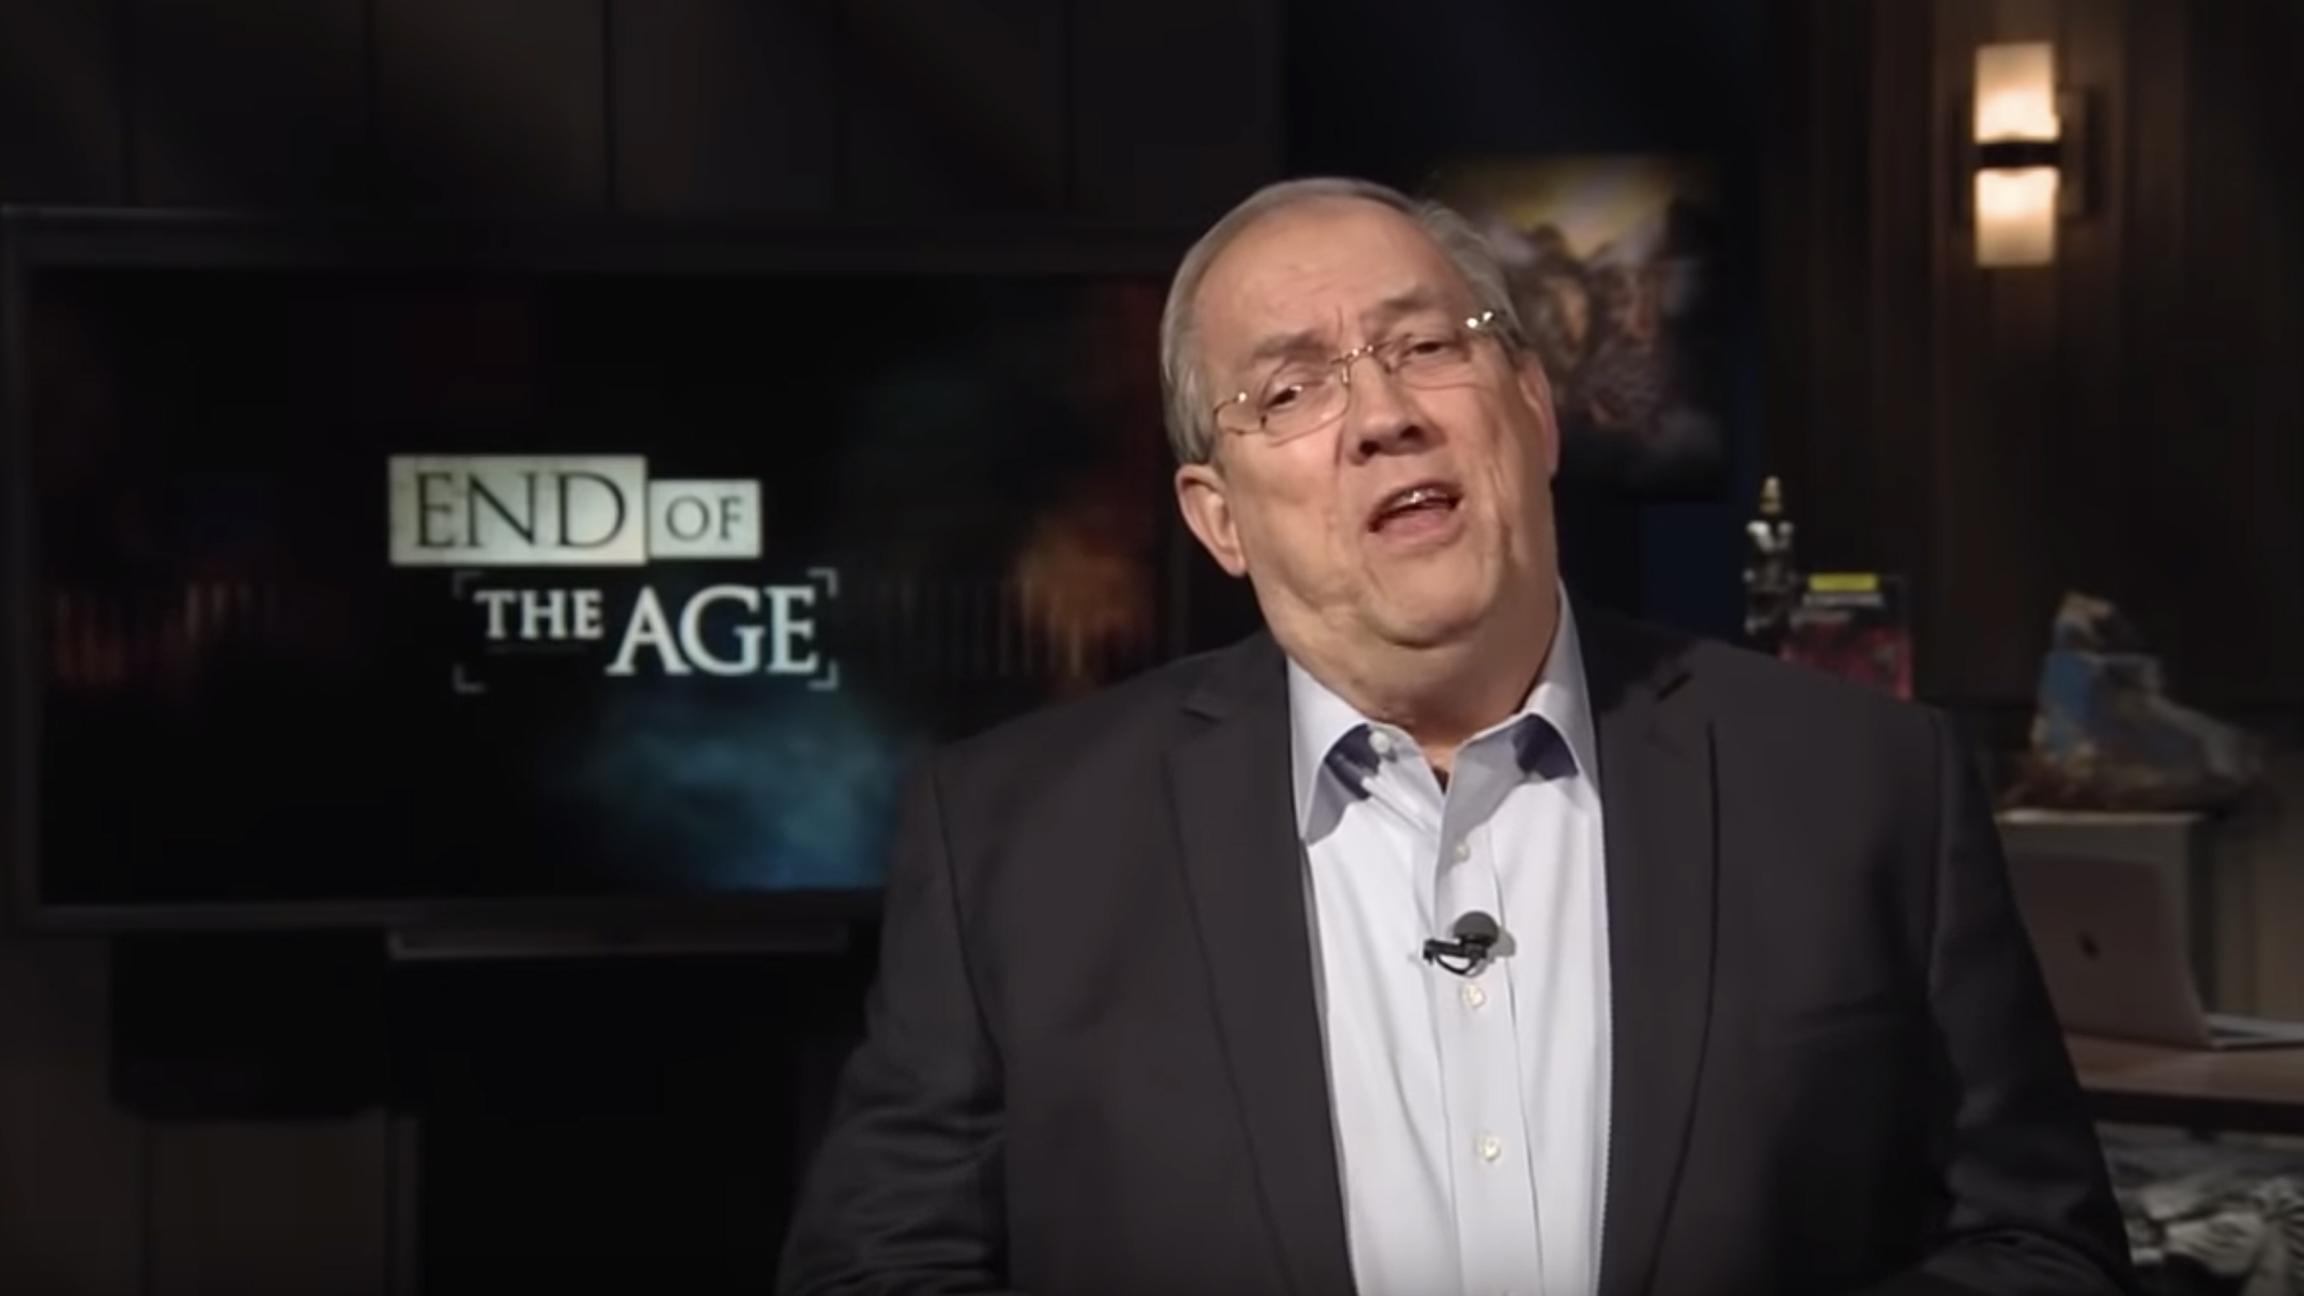 Will America Recover Morally?